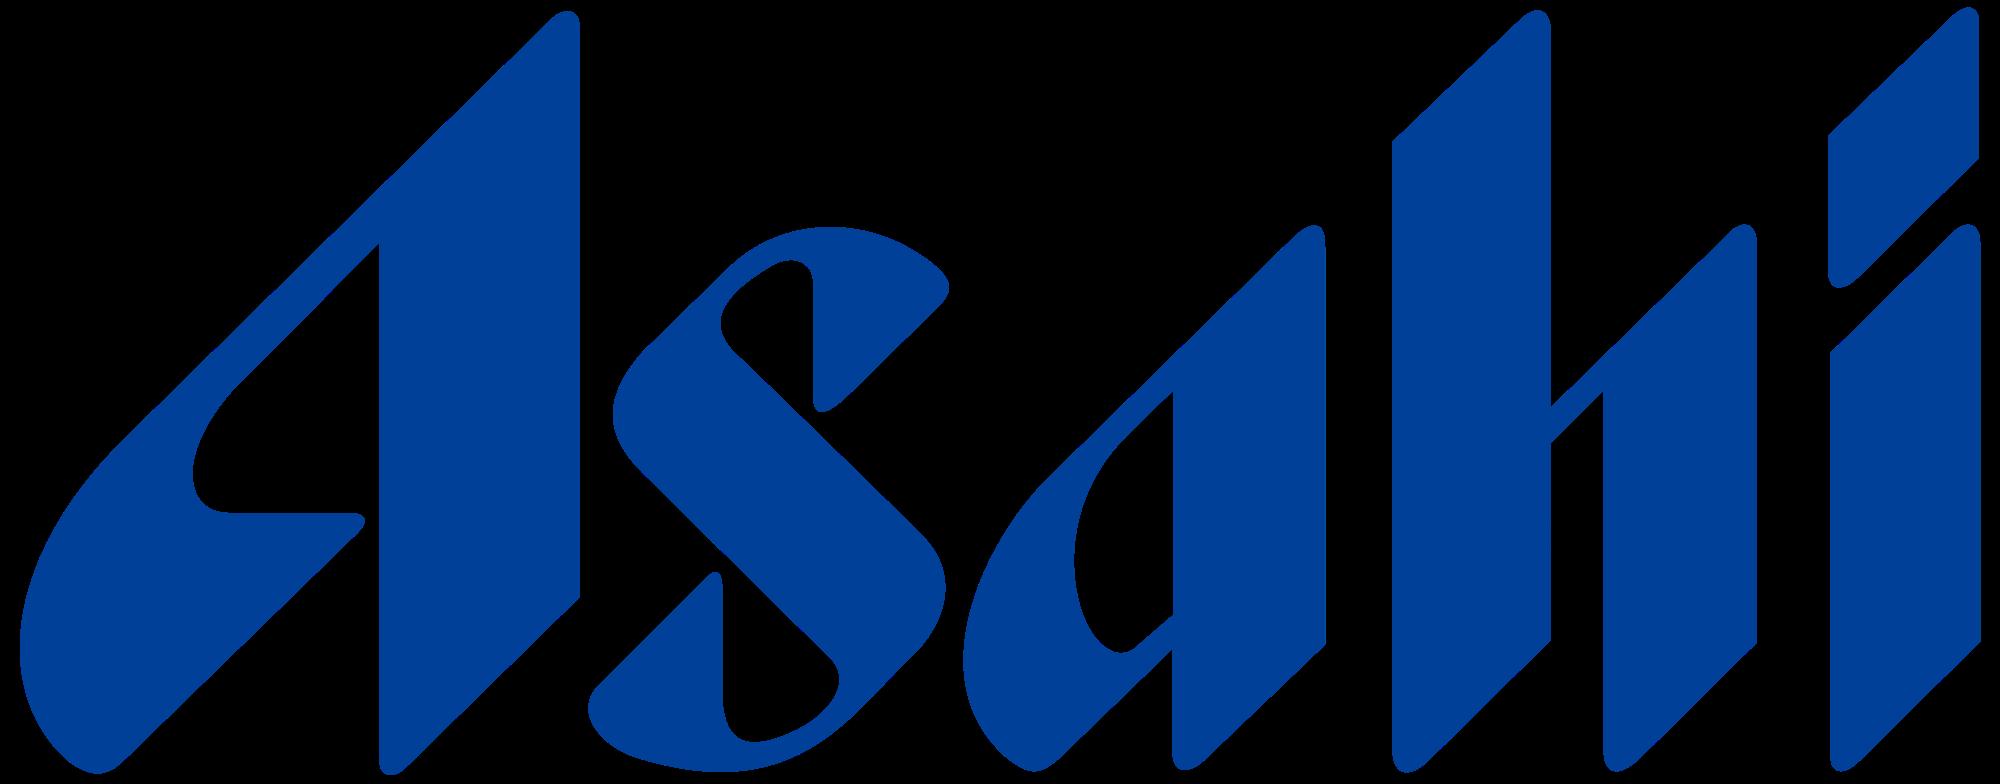 Open PlusPng.com  - Logo Asahi Breweries PNG